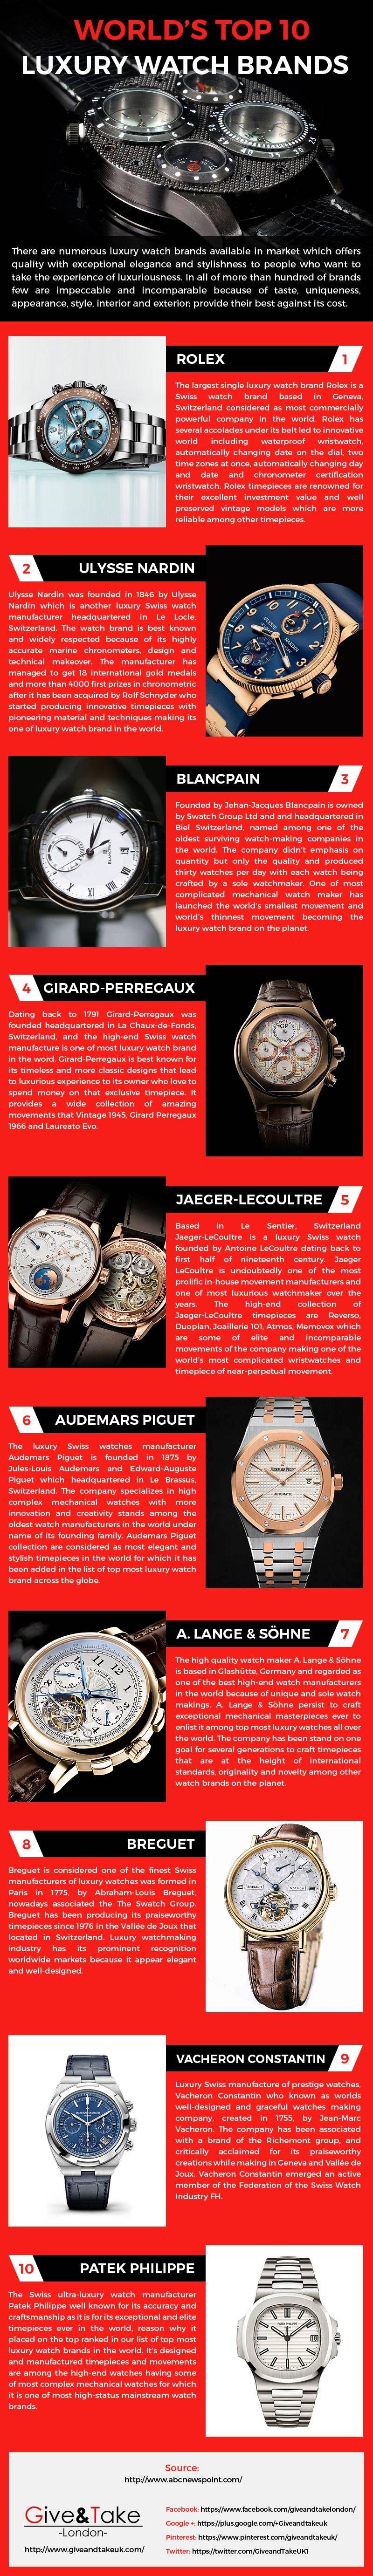 World S Top 10 Luxury Watch Brands Infographic Luxury